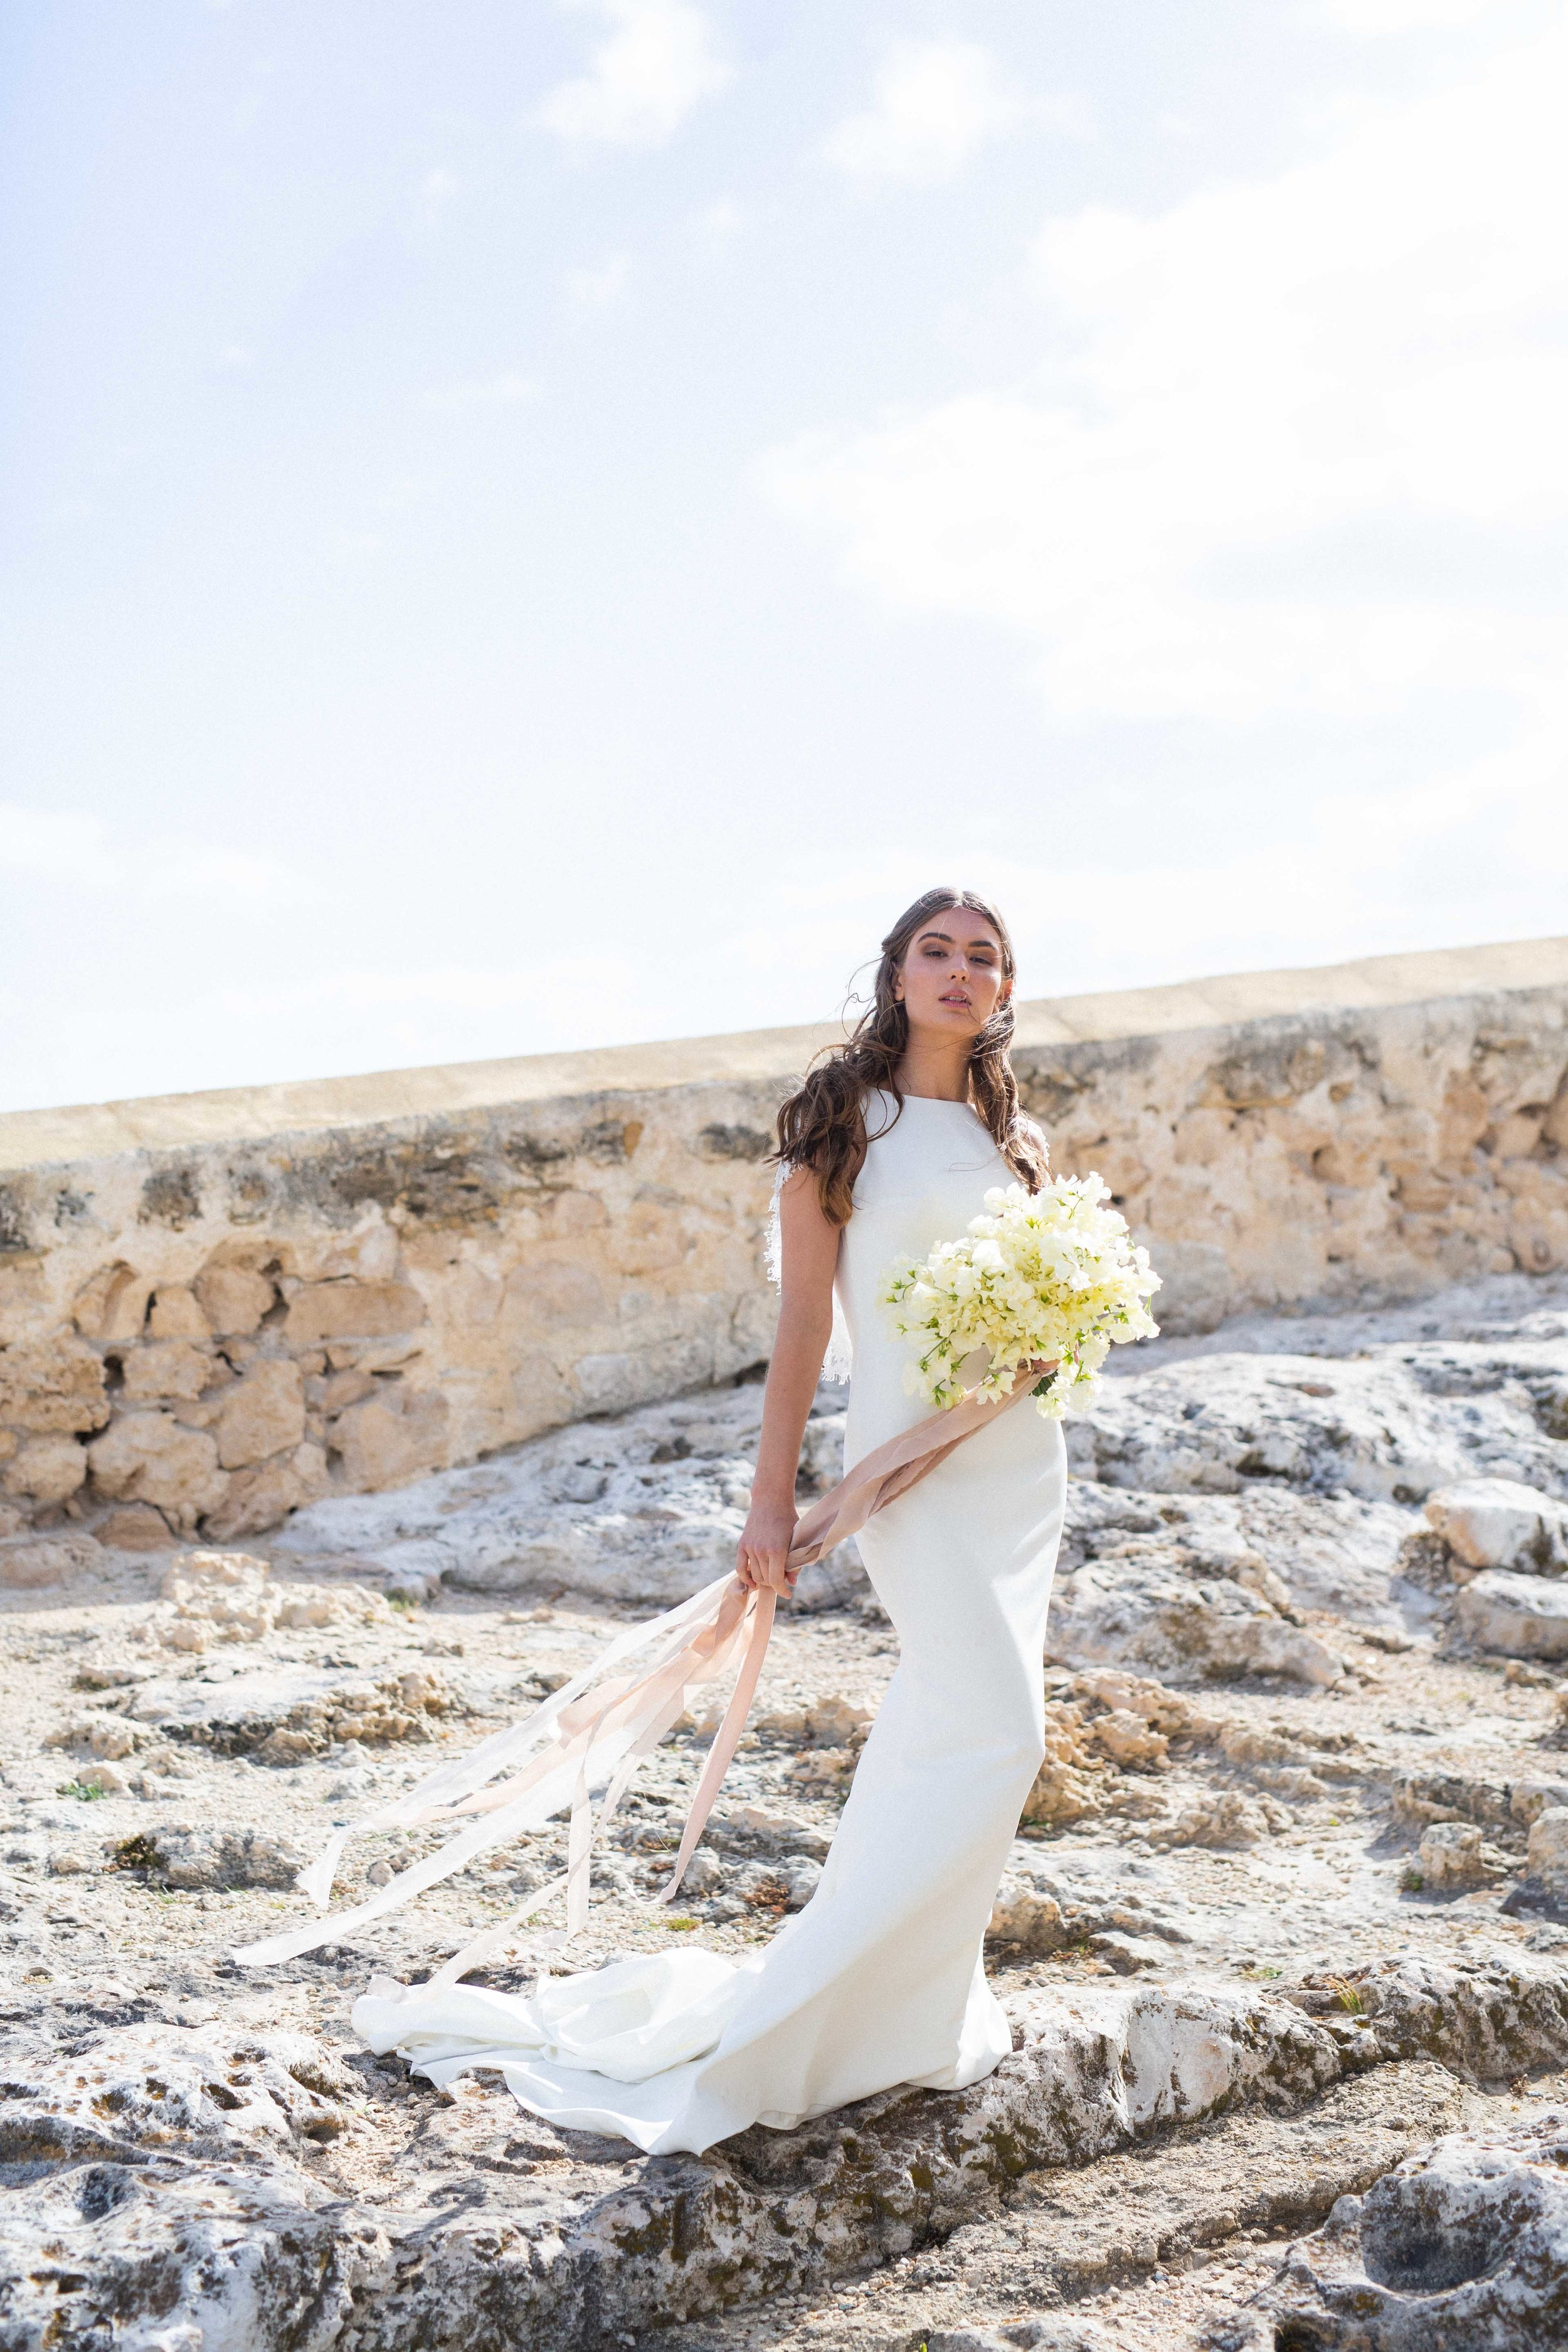 Fremantle Wedding Walk - Blue HQ, Perth Wedding Venue -  Tessa Kit Photography -JQ9A9275-Edit.jpg